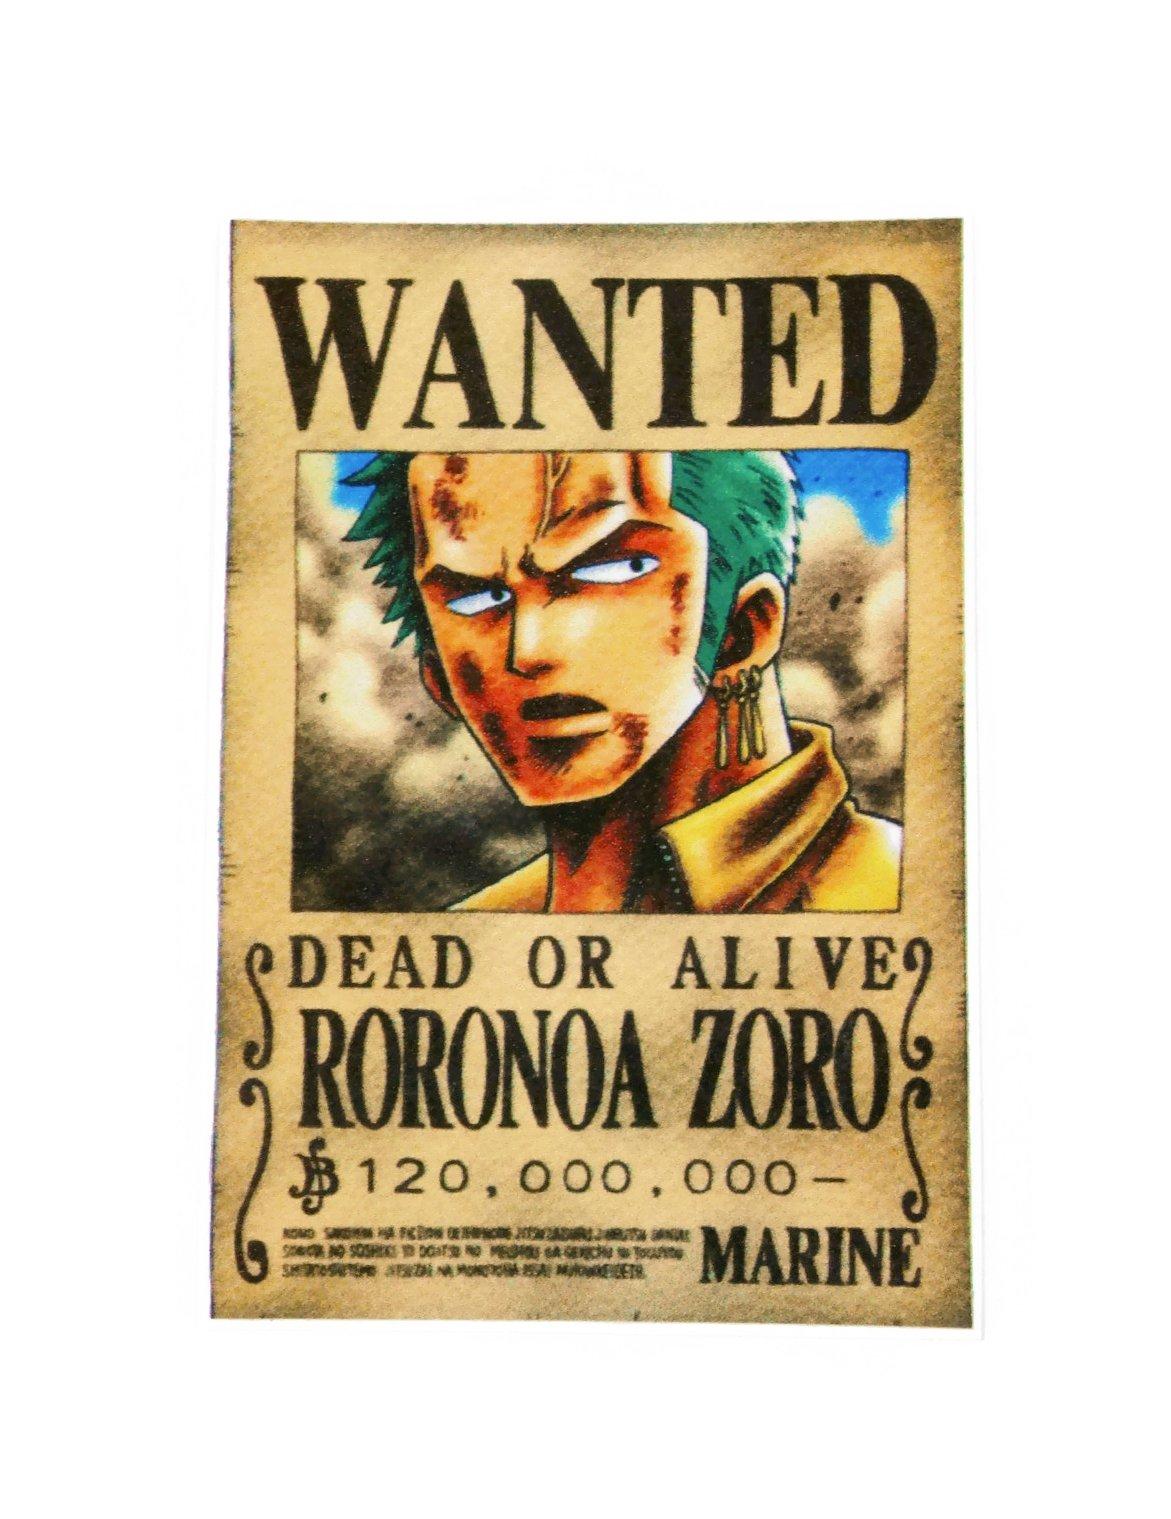 One Piece Roronoa Zoro Sticker Skateboard Laptop Luggage Decals Buy Online In Azerbaijan At Azerbaijan Desertcart Com Productid 26229090